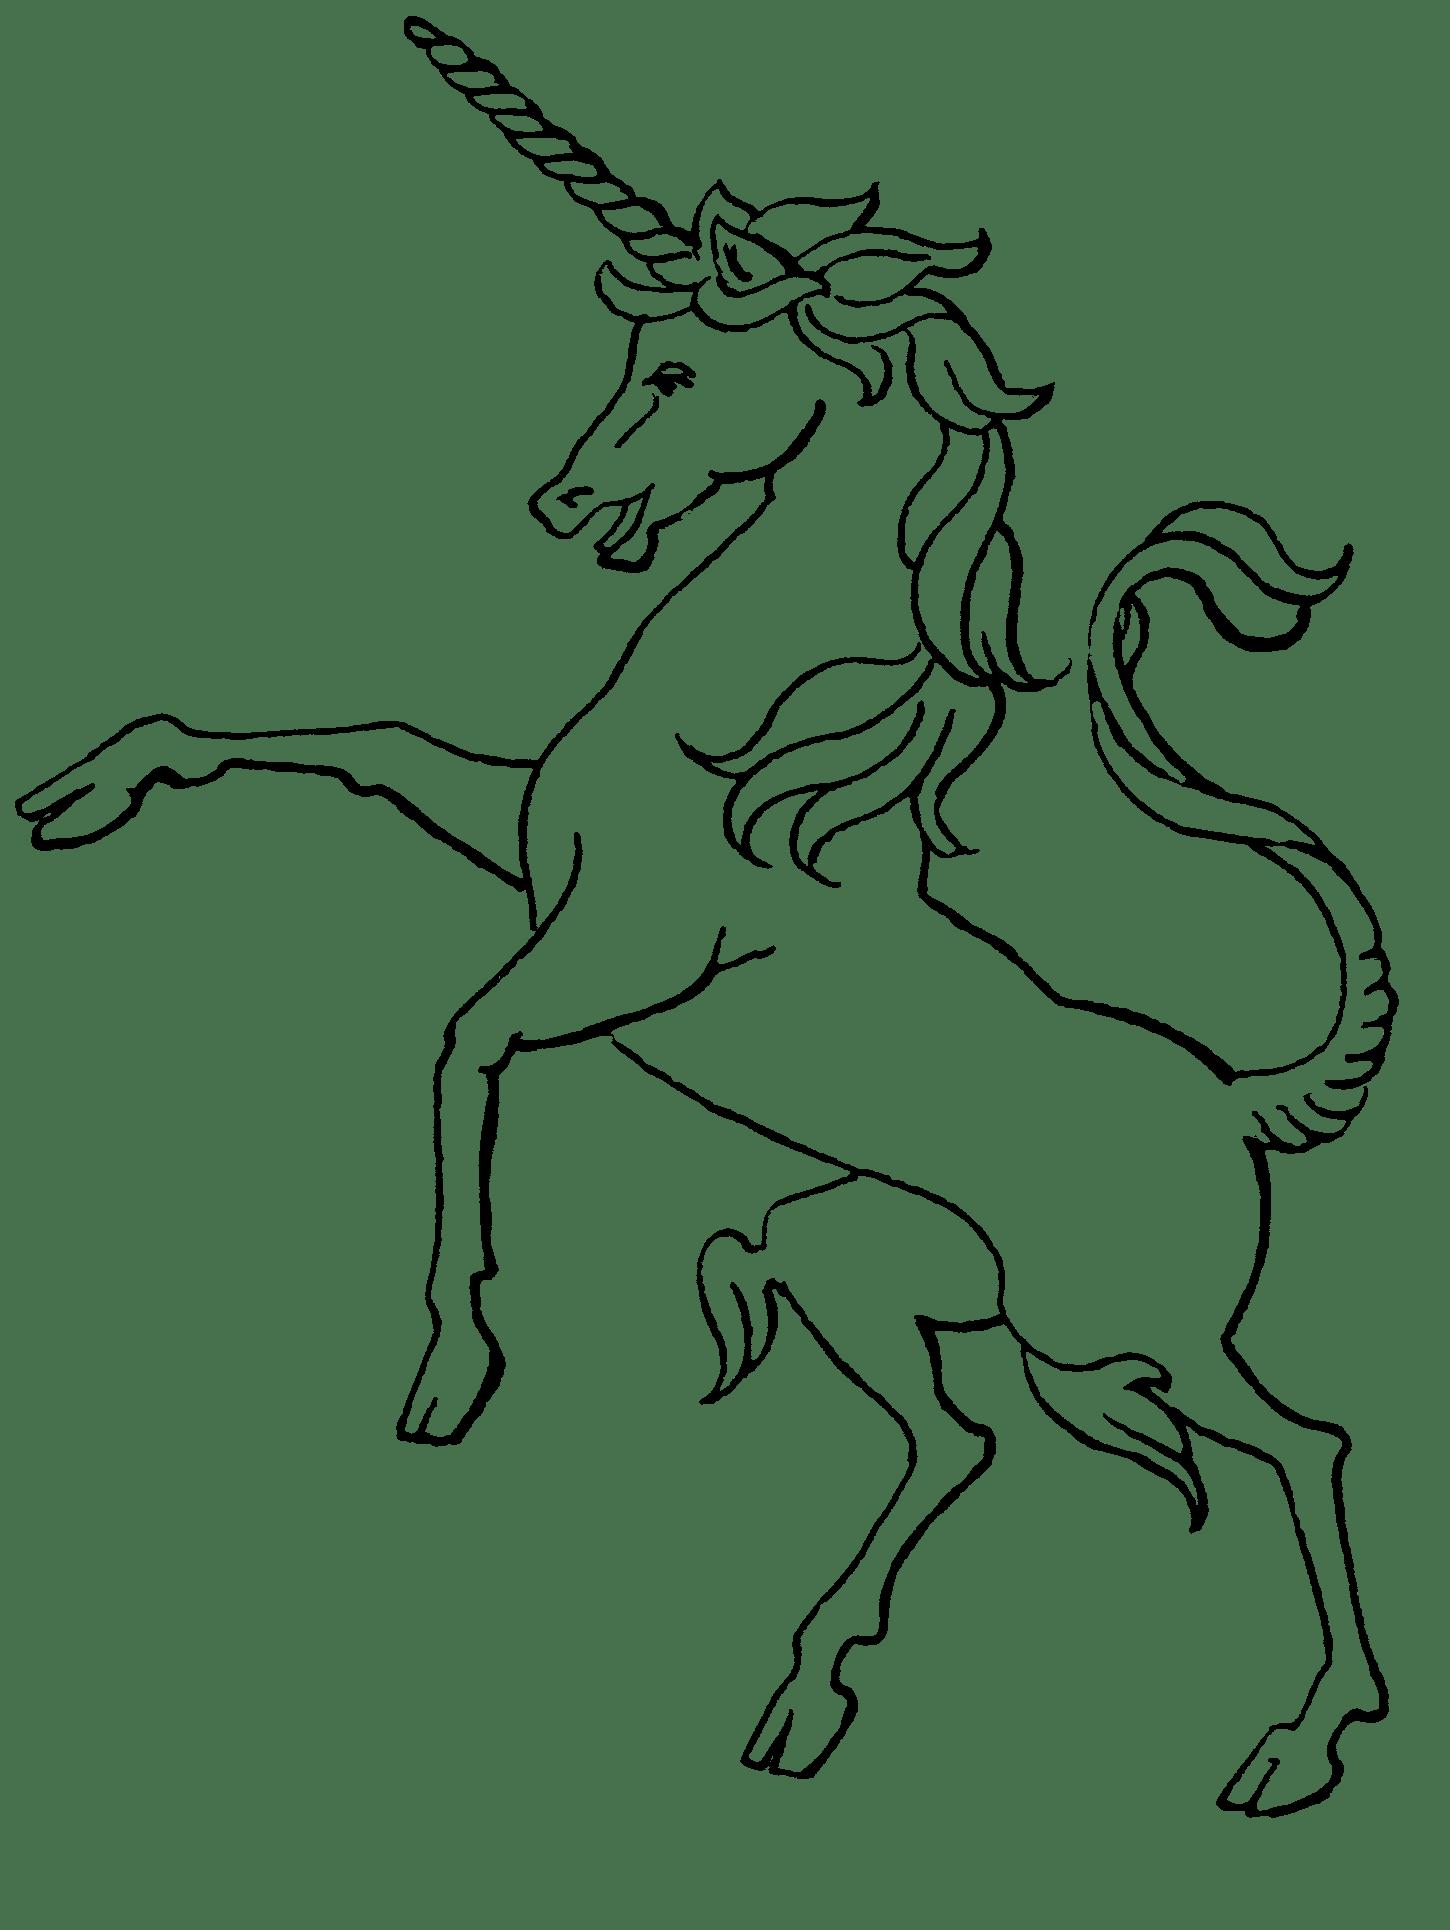 Medieval clipart unicorn, Medieval unicorn Transparent